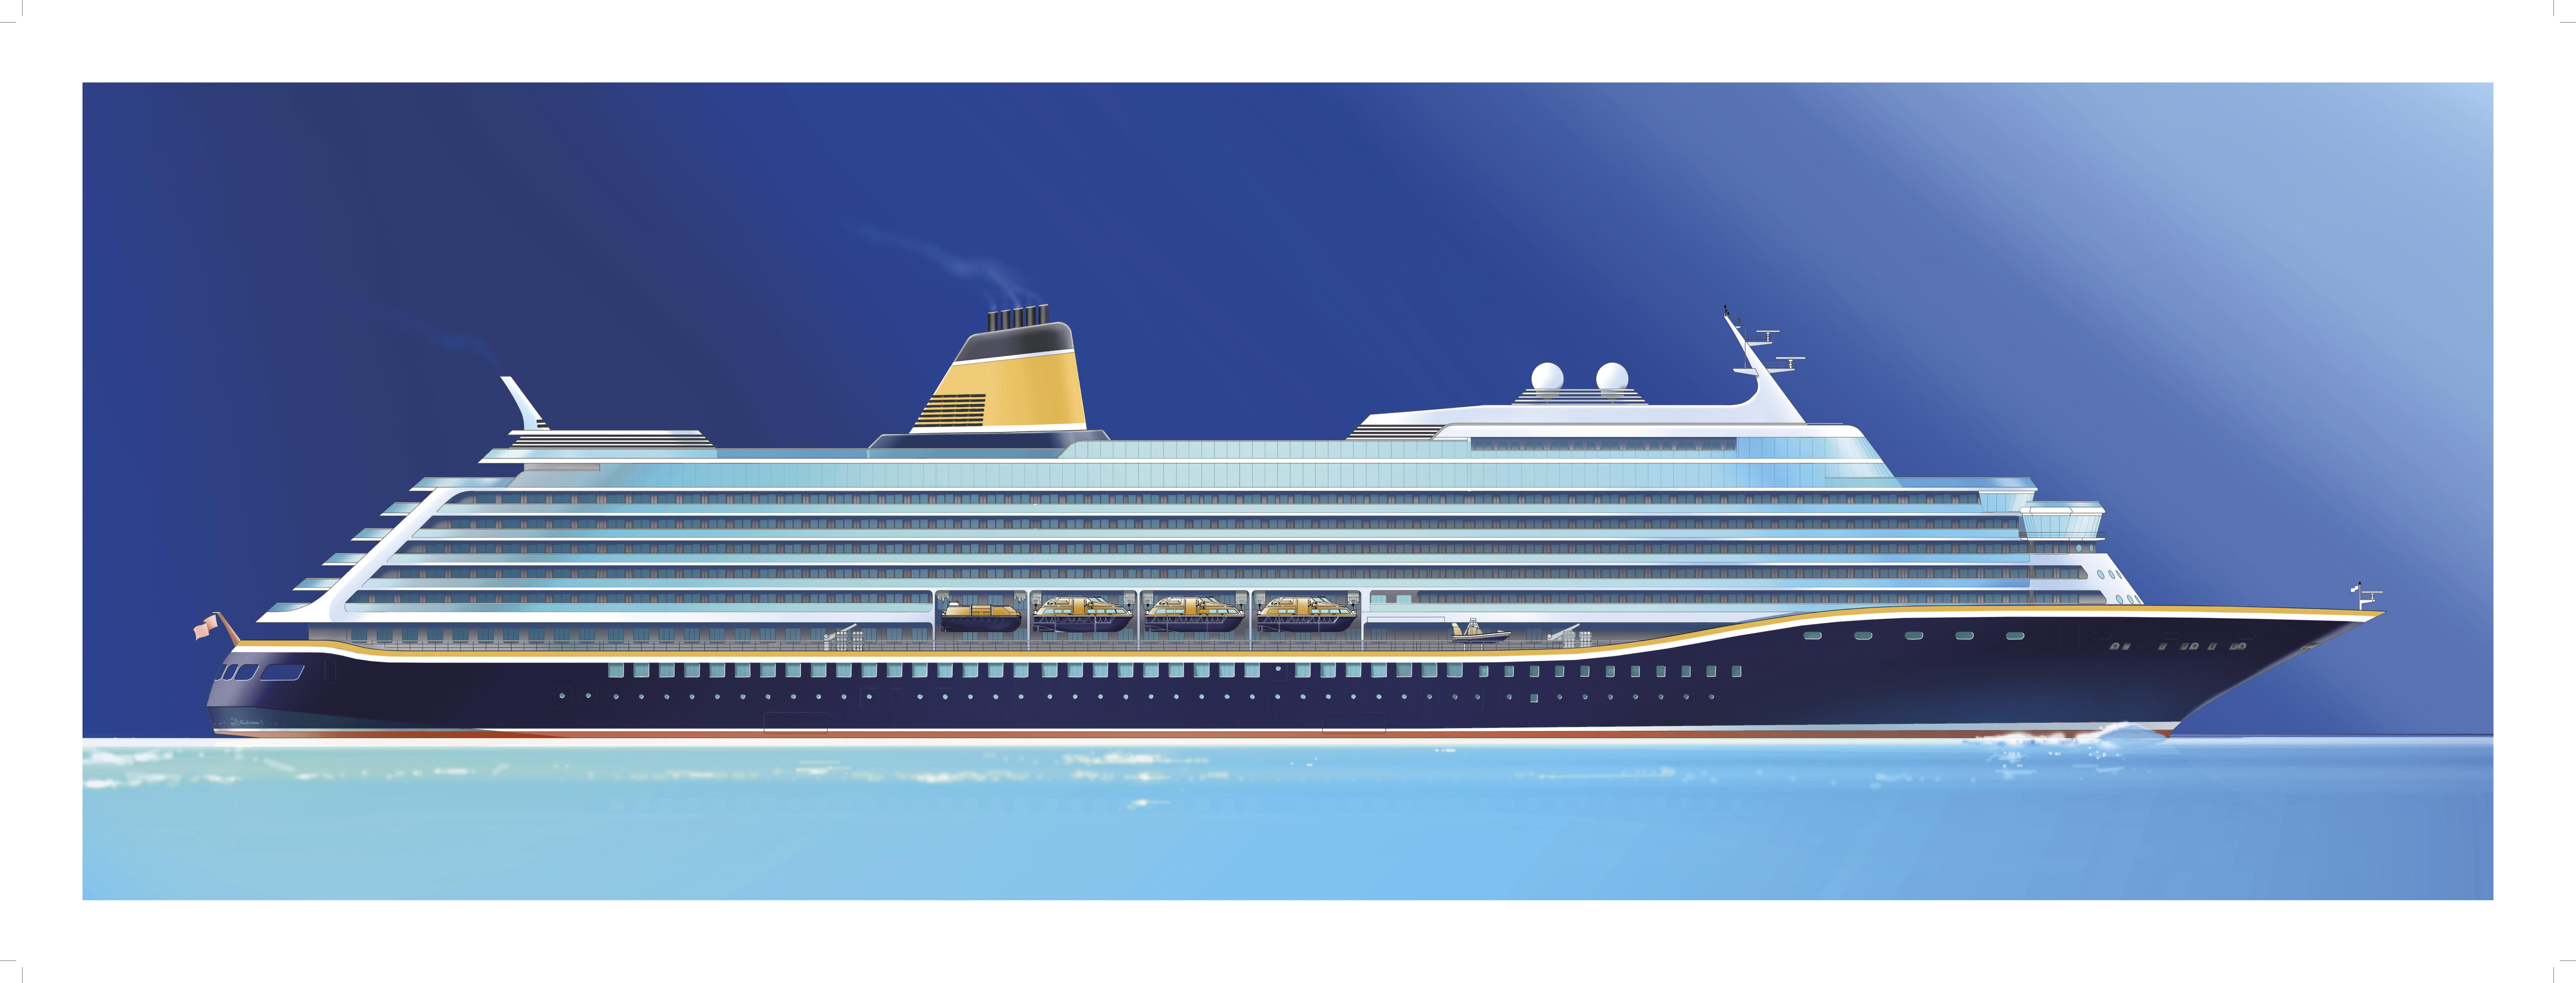 NEW Ship To Join The Saga Cruises Fleet In 2019 | CruiseMiss Cruise Blog